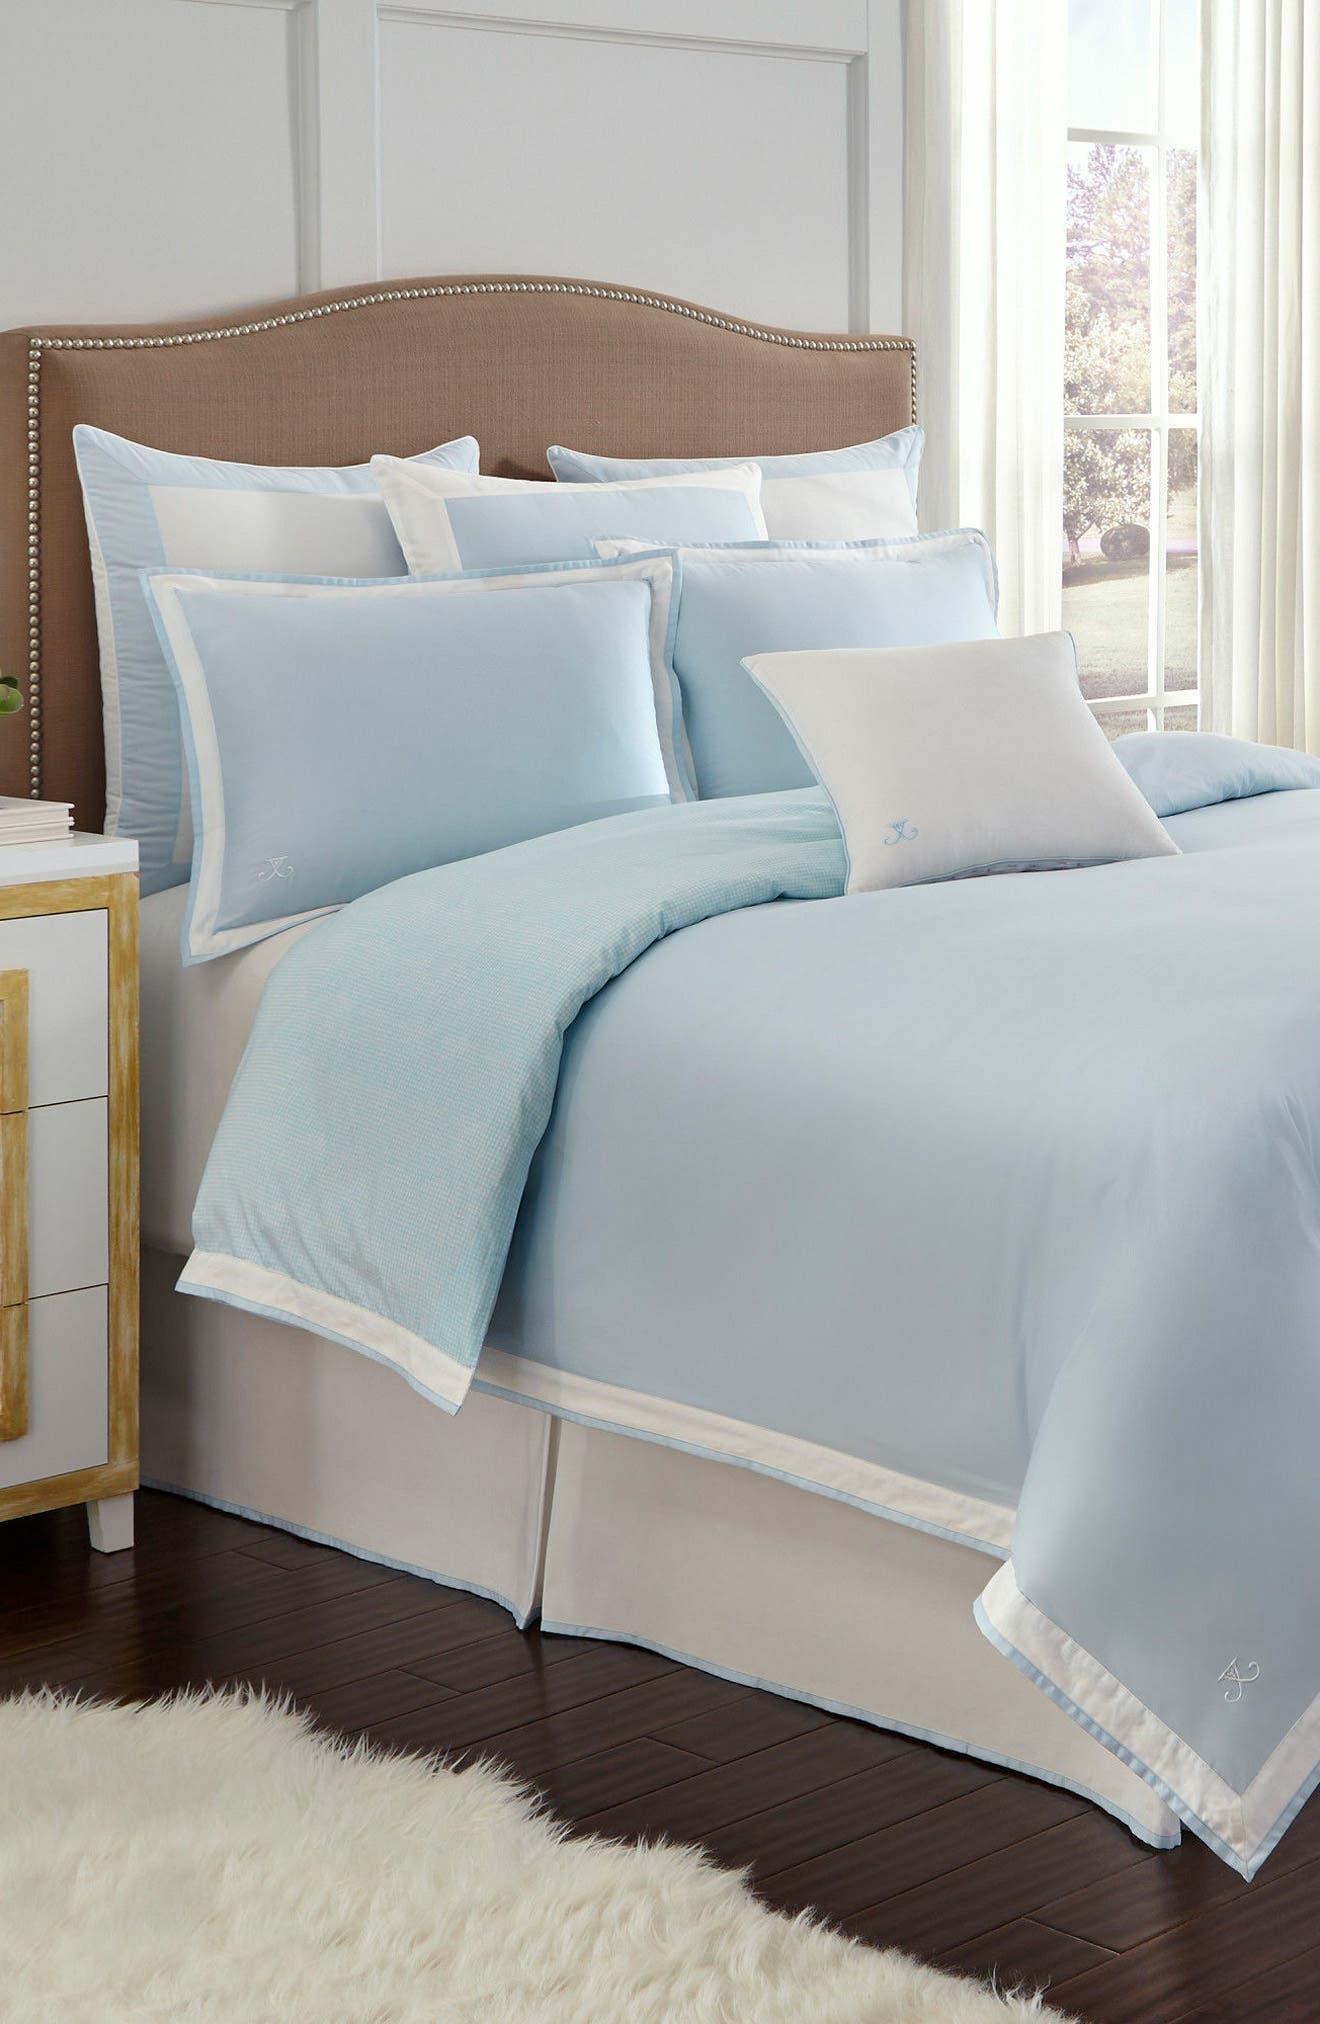 Sugarhouse Comforter,                         Main,                         color, Blue Glow/ White